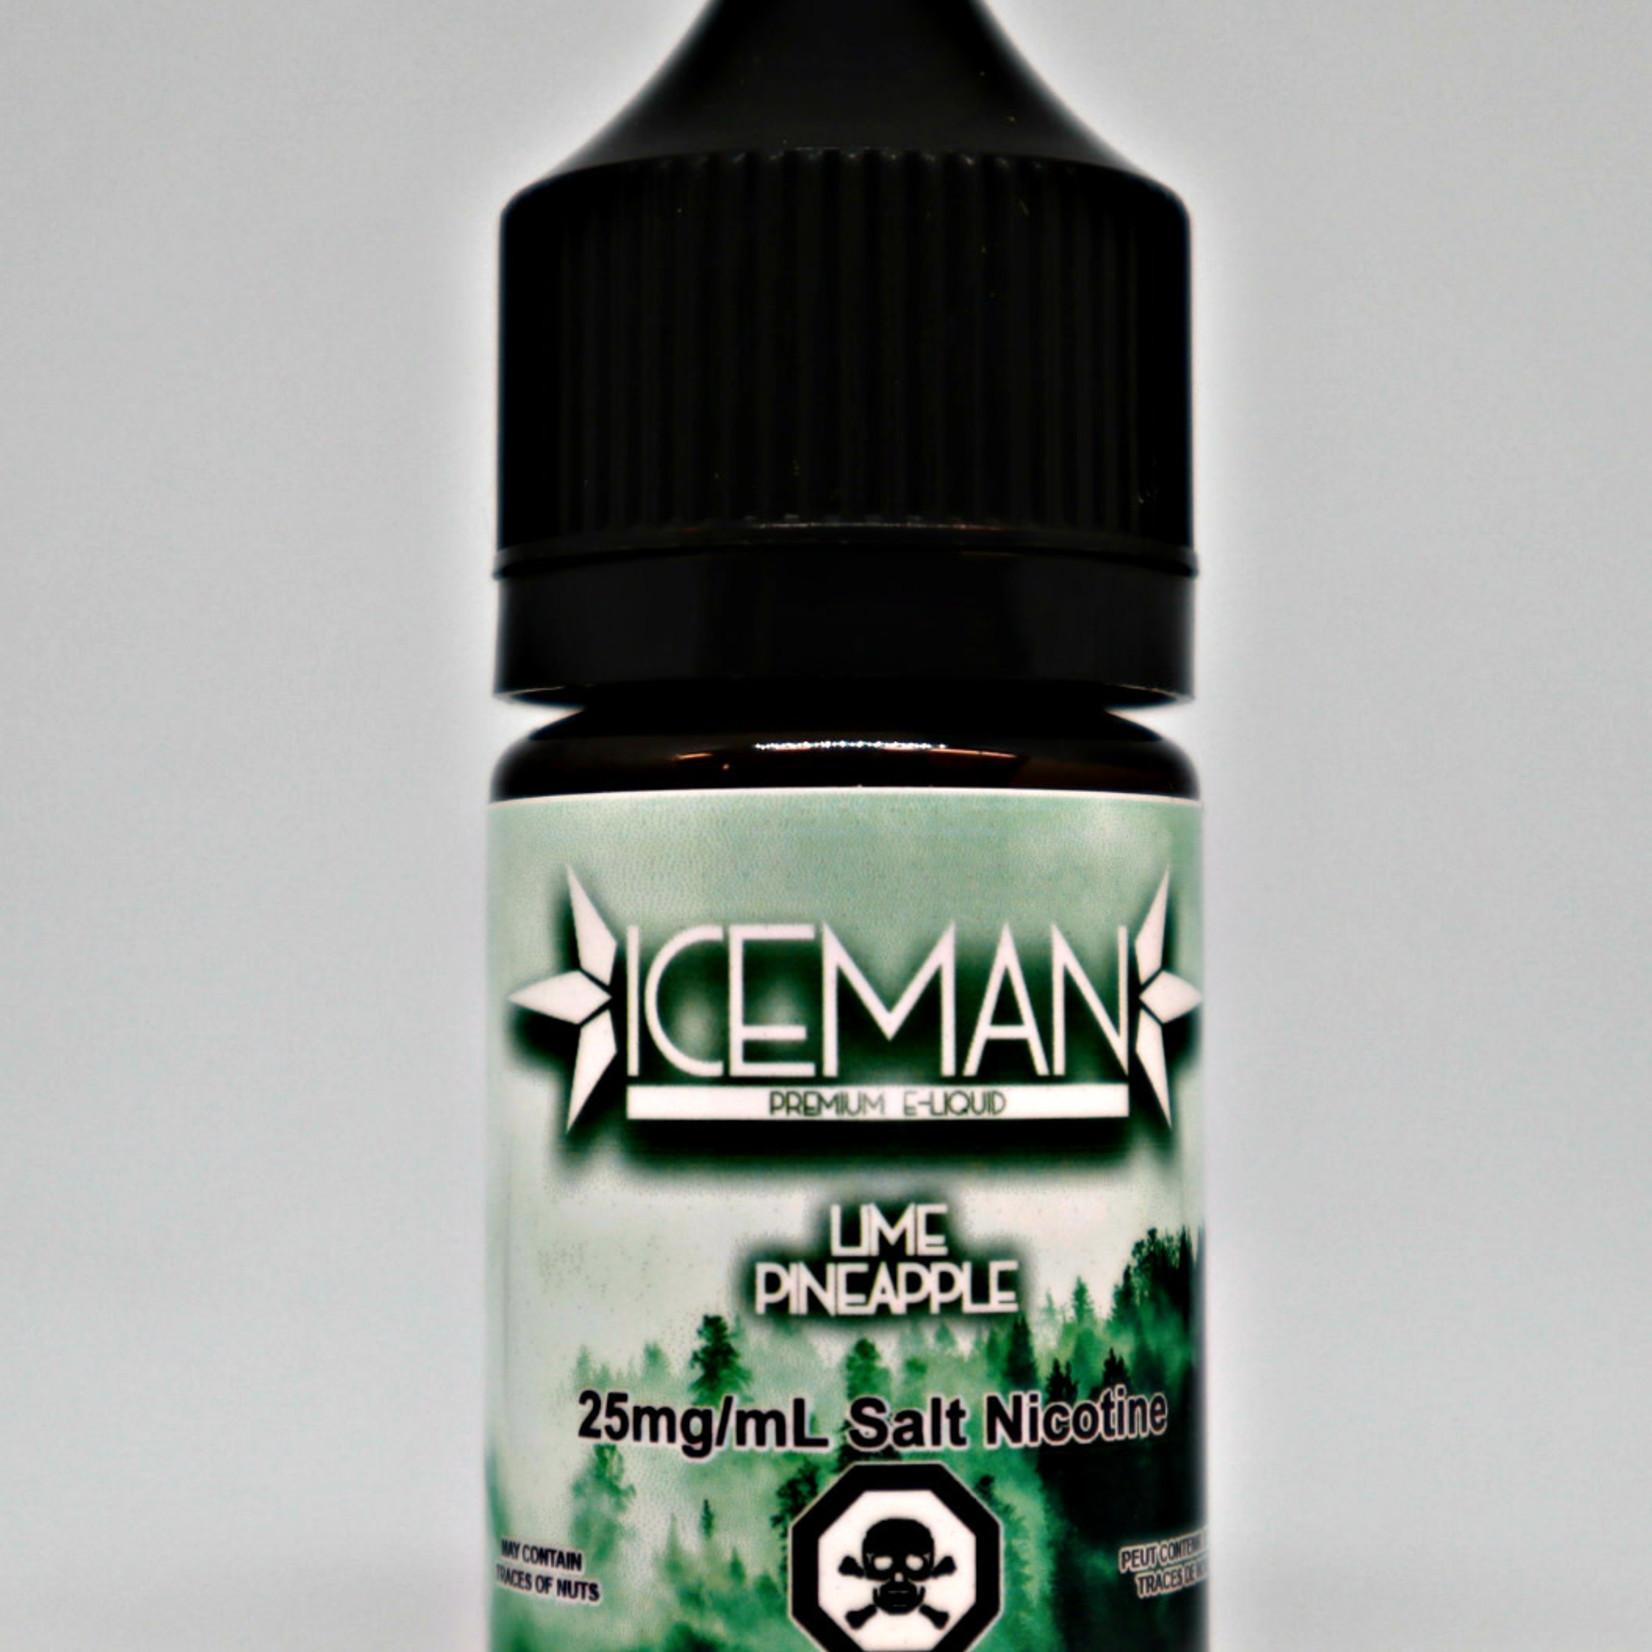 Iceman Lime Pineapple Salt